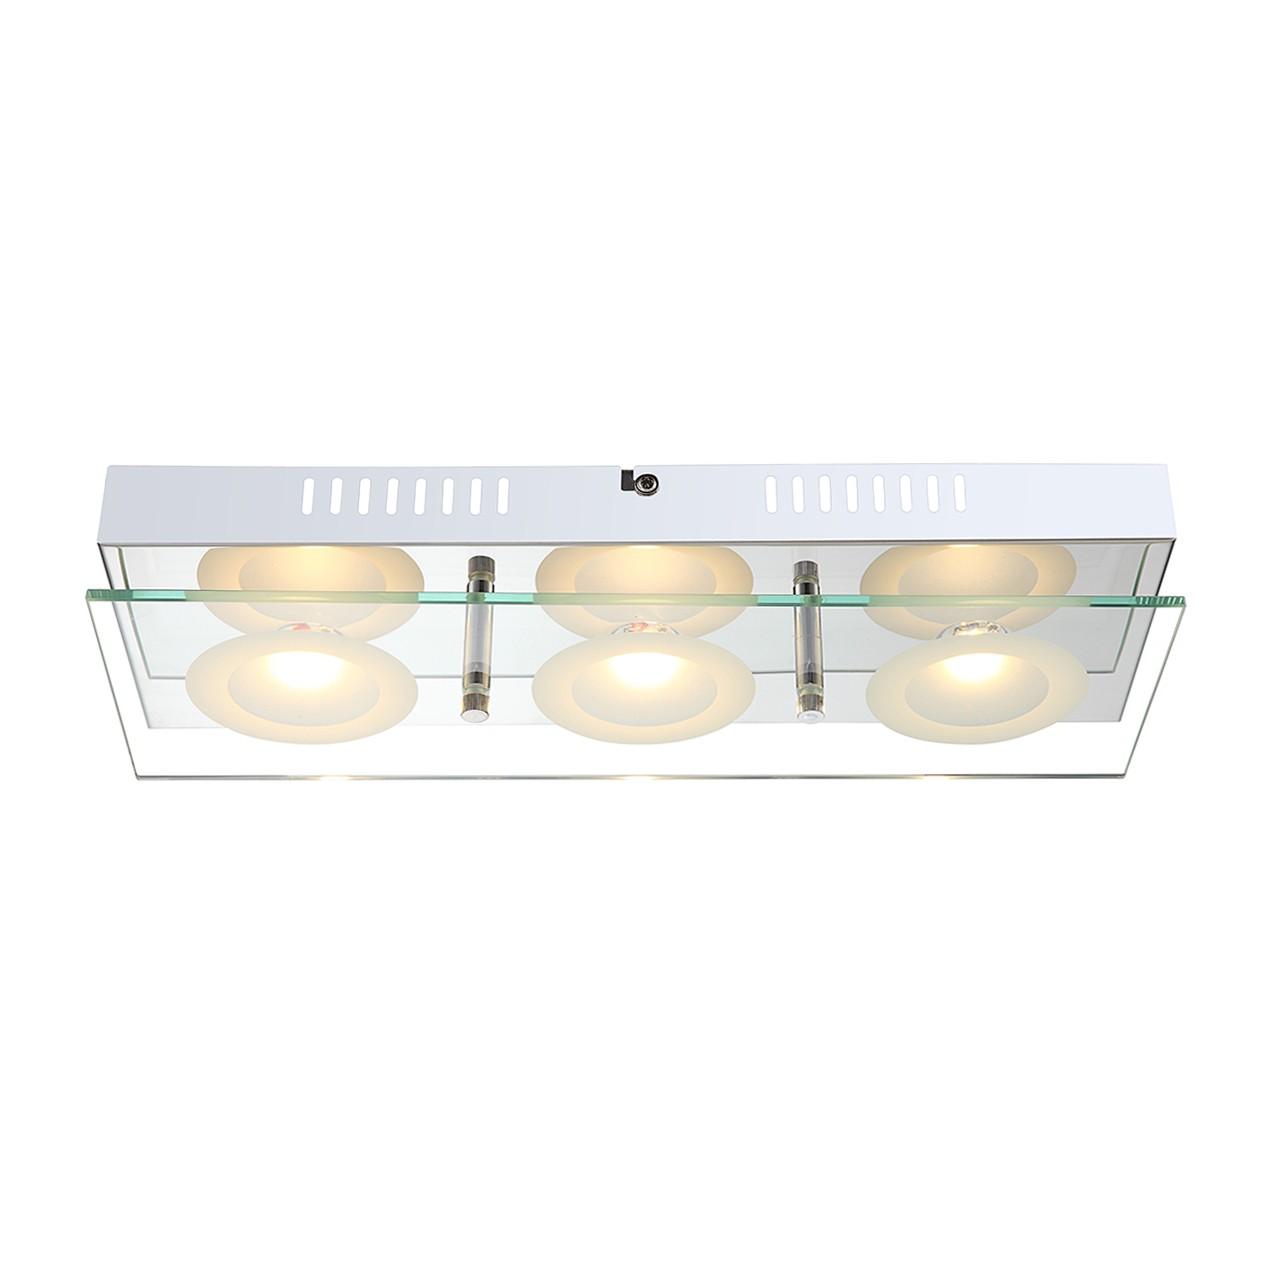 LED-Wandleuchte Oda 3-flammig ● Silber Metall- verchromt- Globo Lighting A+